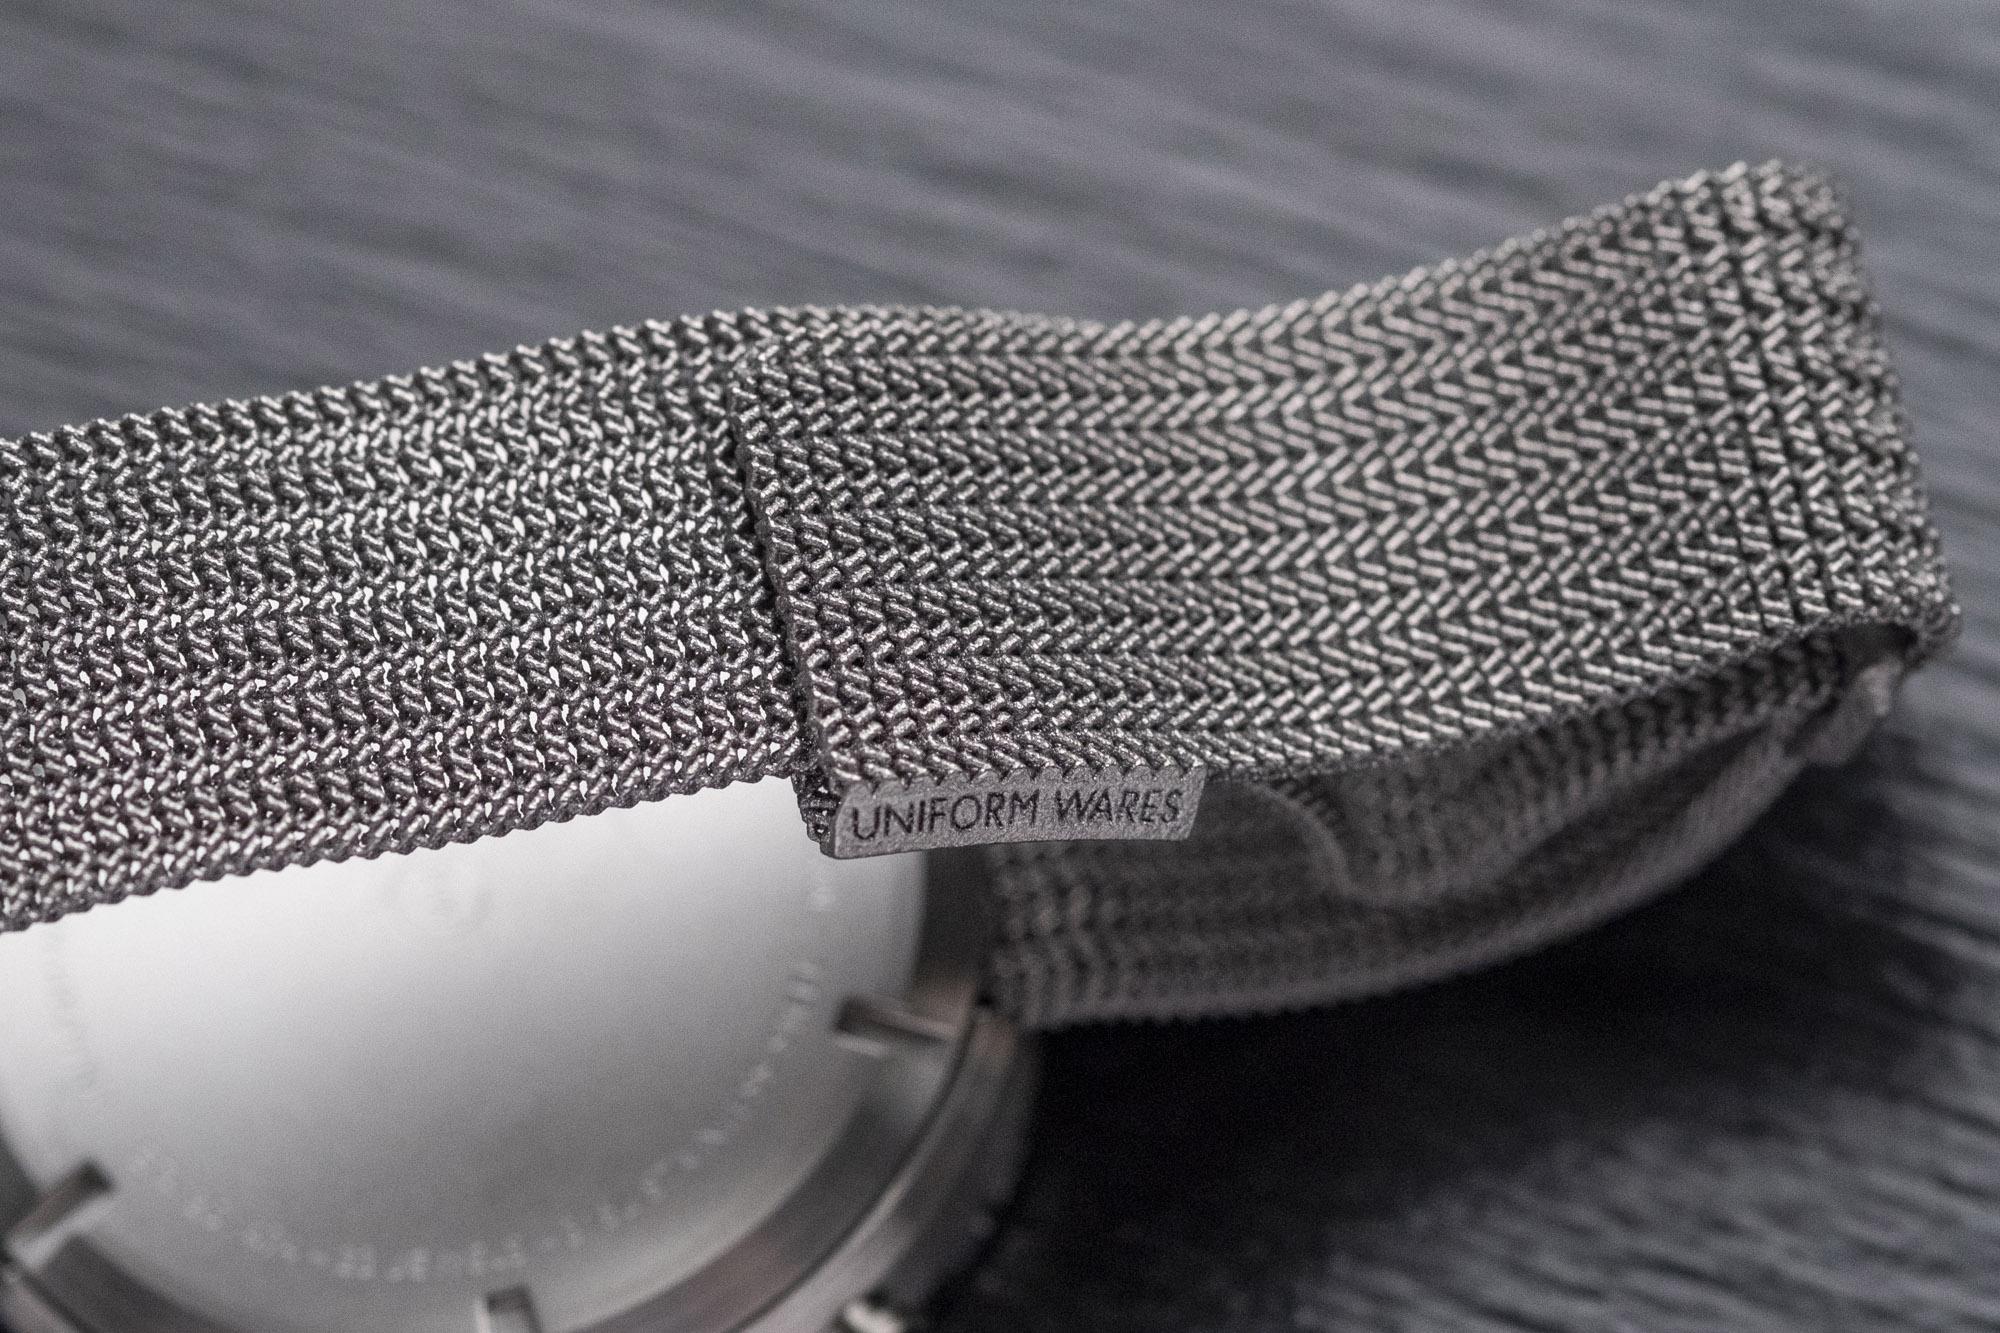 uniformwares-titan-strap